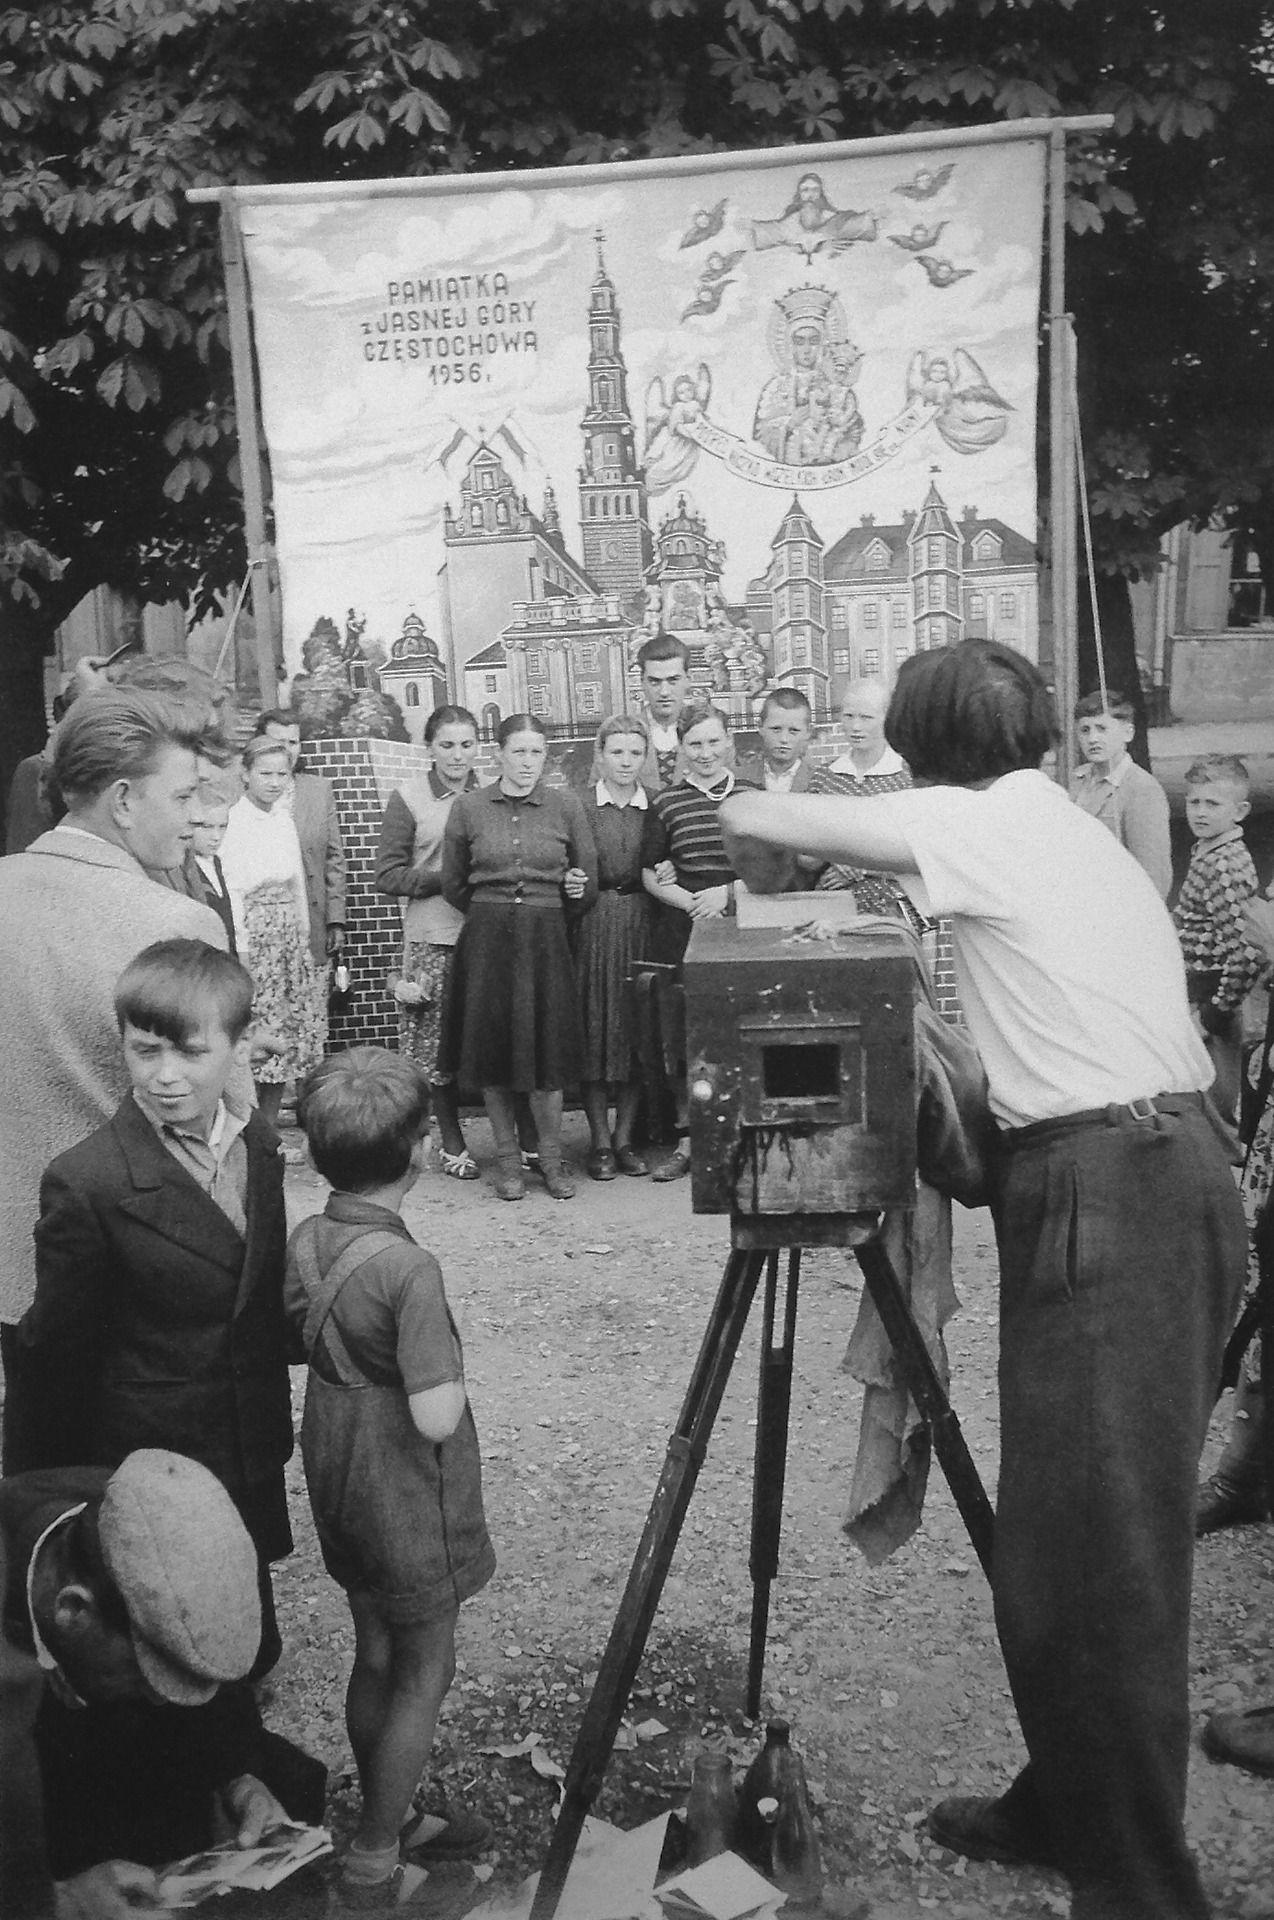 Poland 1956 Photo: Erich Lessing